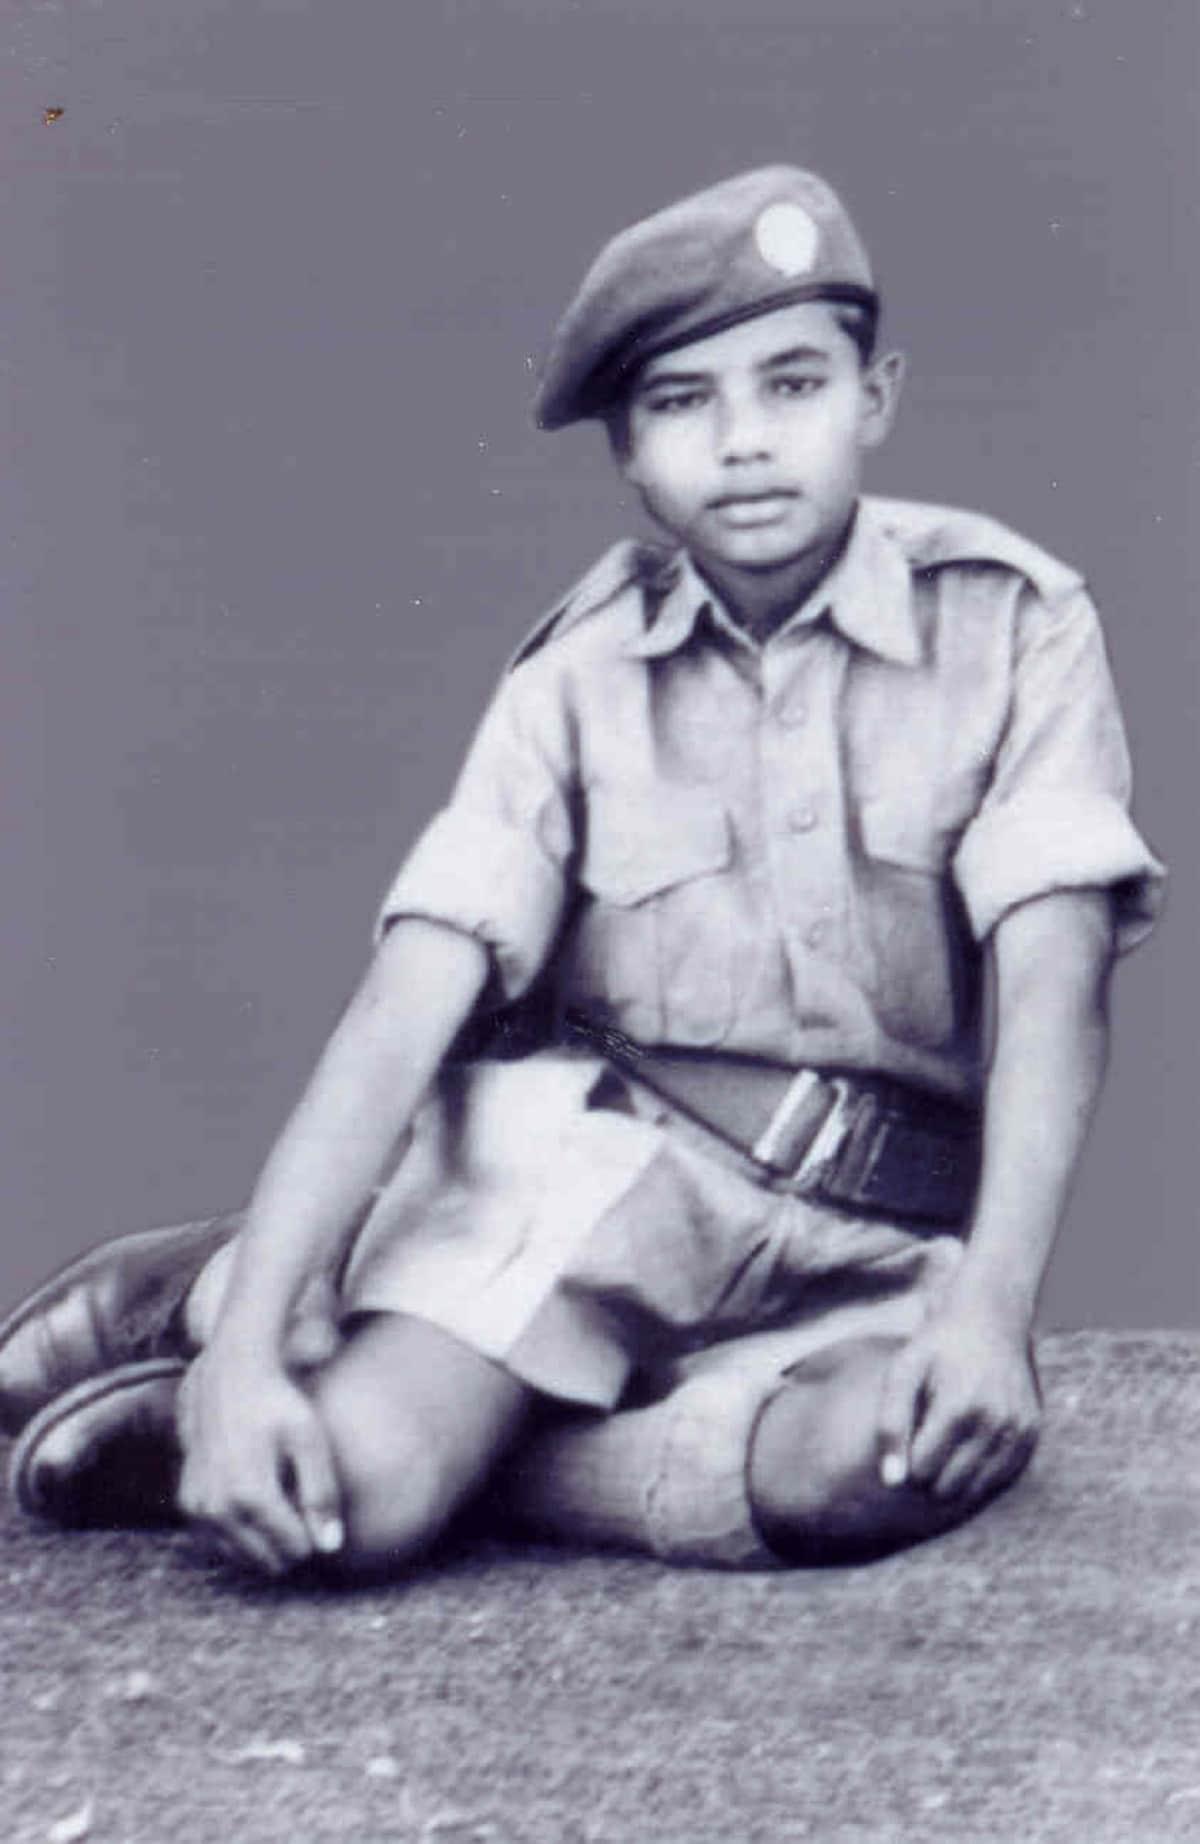 A childhood picture of PM Narendra Modi in his NCC uniform. Born to a Gujarati family inVadnagar, Modi helped his father sell tea.